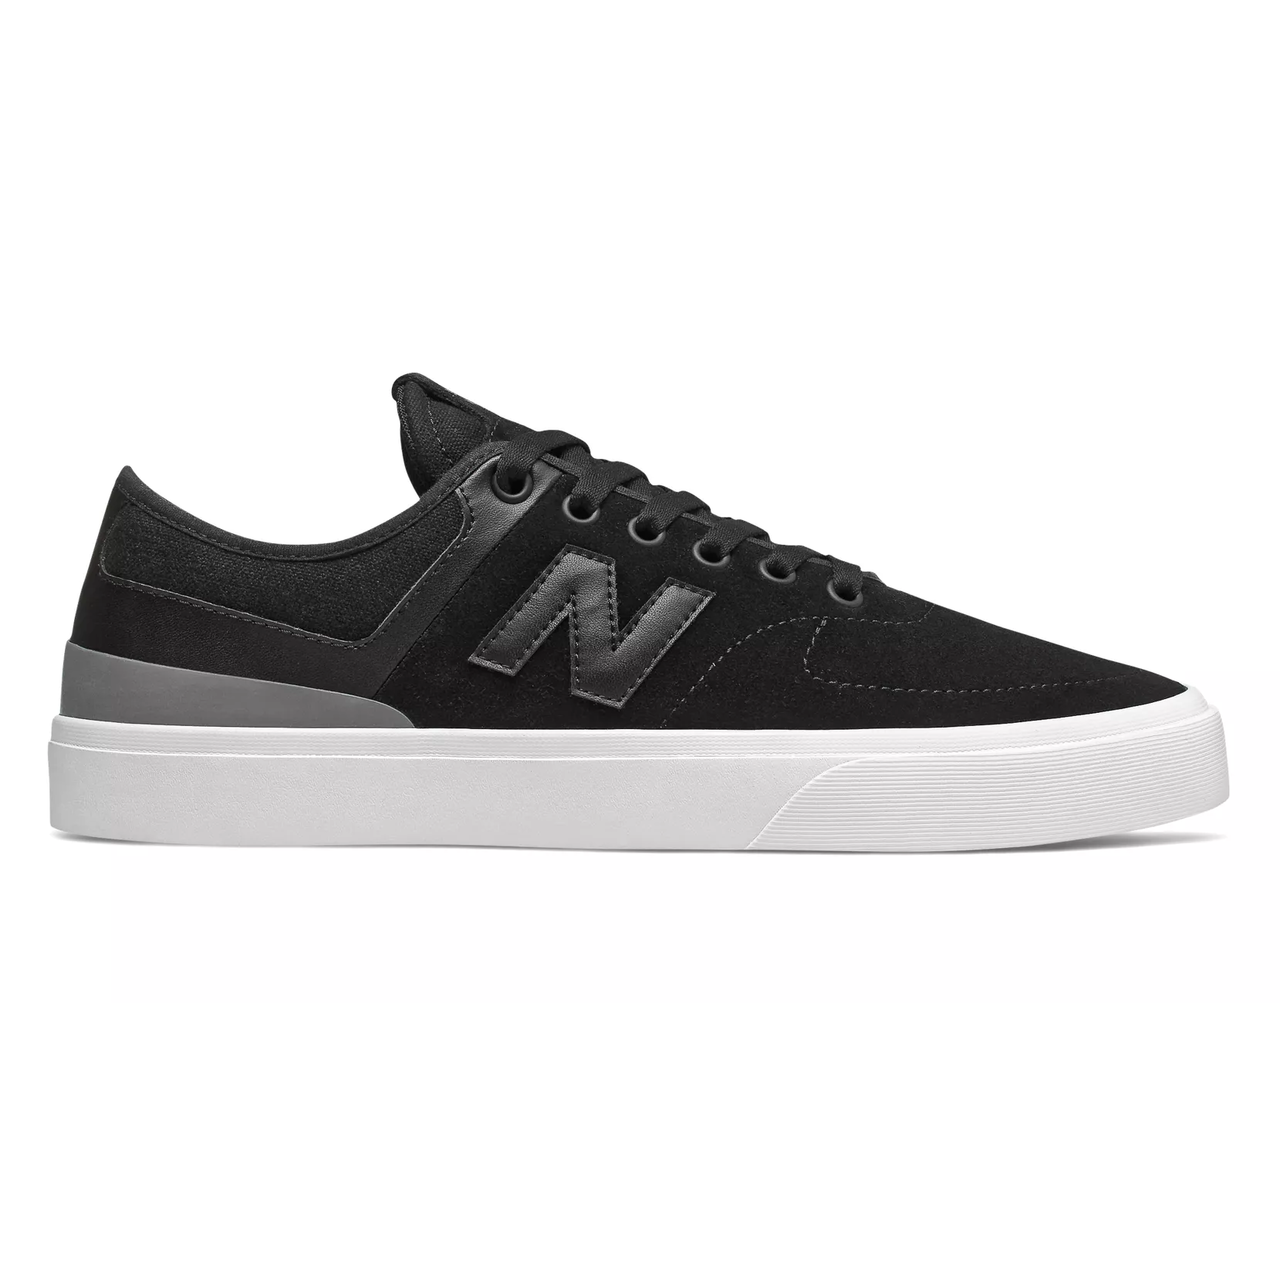 New Balance Numeric 379 Black/Grey 13